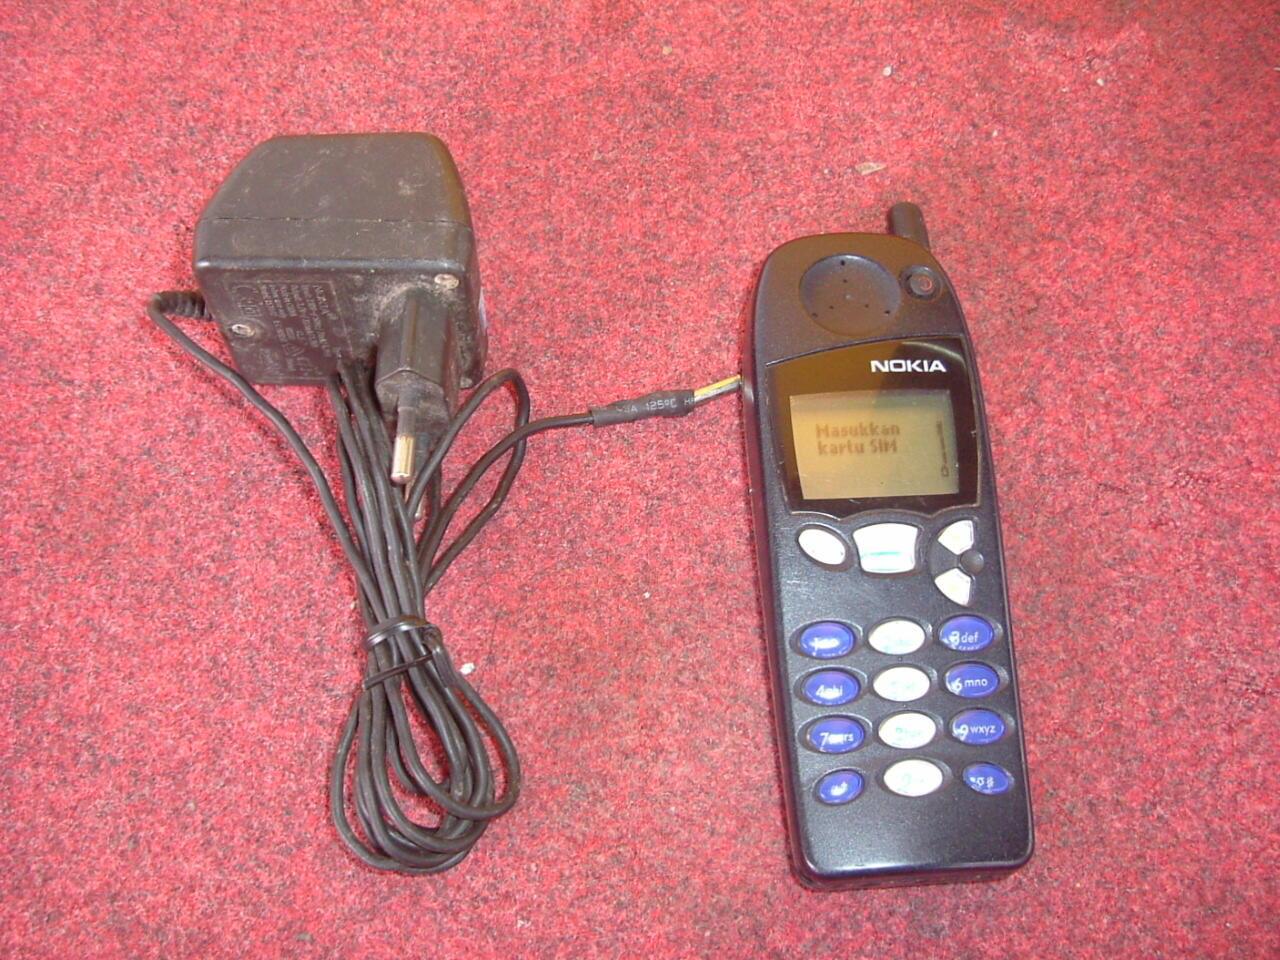 Nokia JADUL Nokia Lama normal 5110 gsm bekas solo murah